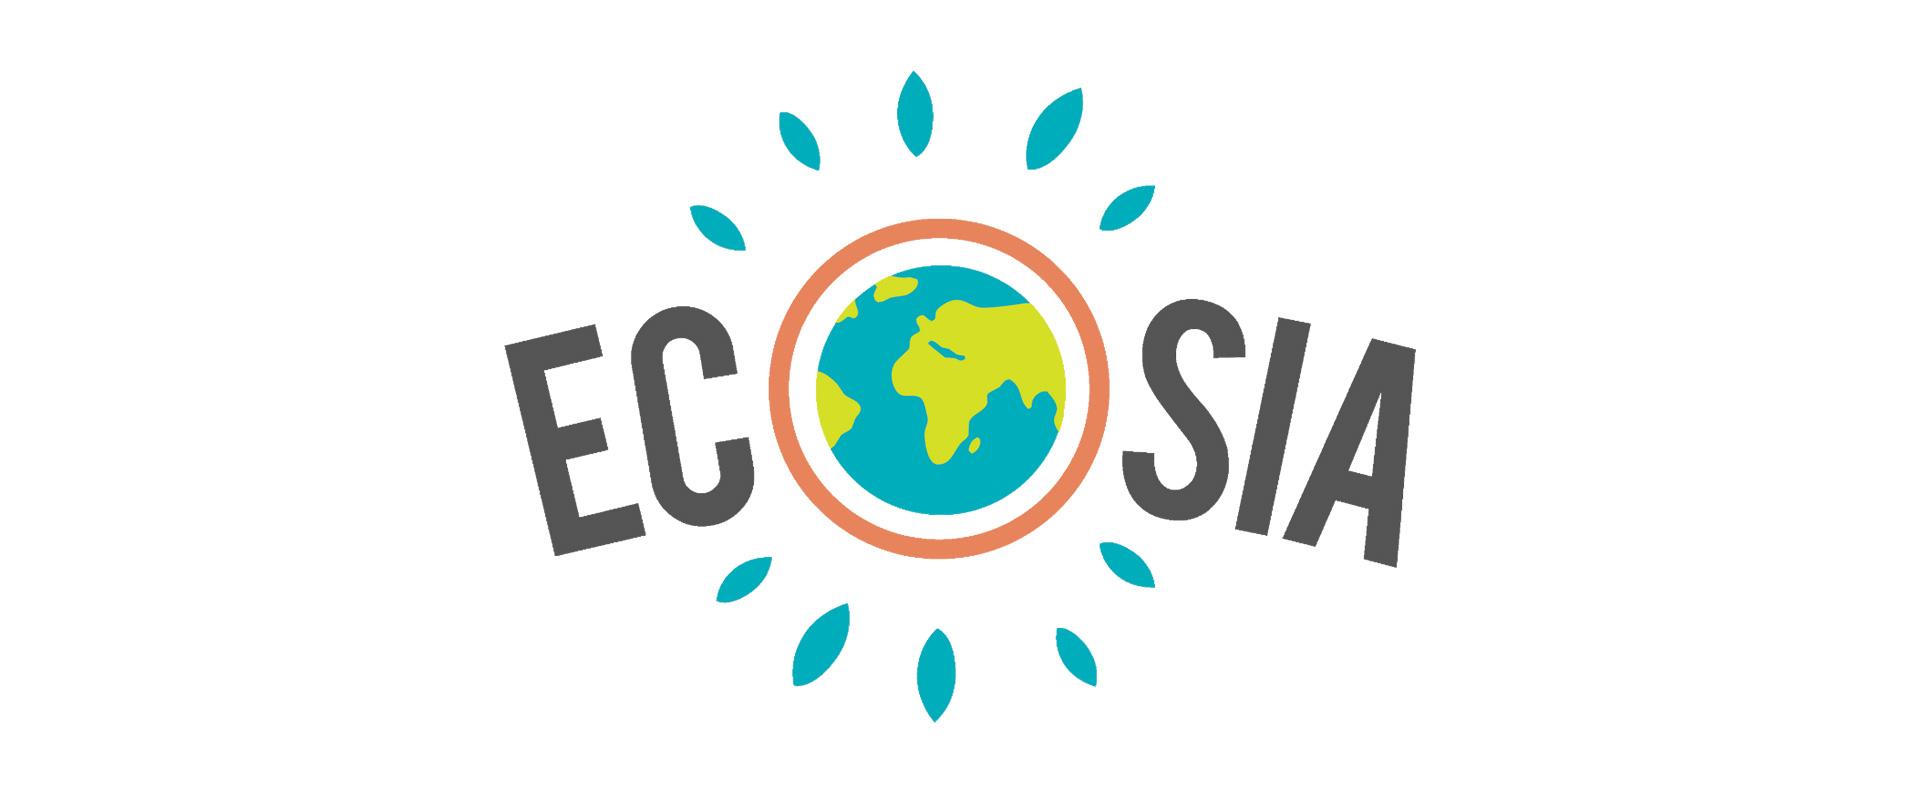 Ecosia : le moteur de recherche qui plante des arbres - Trade Discount